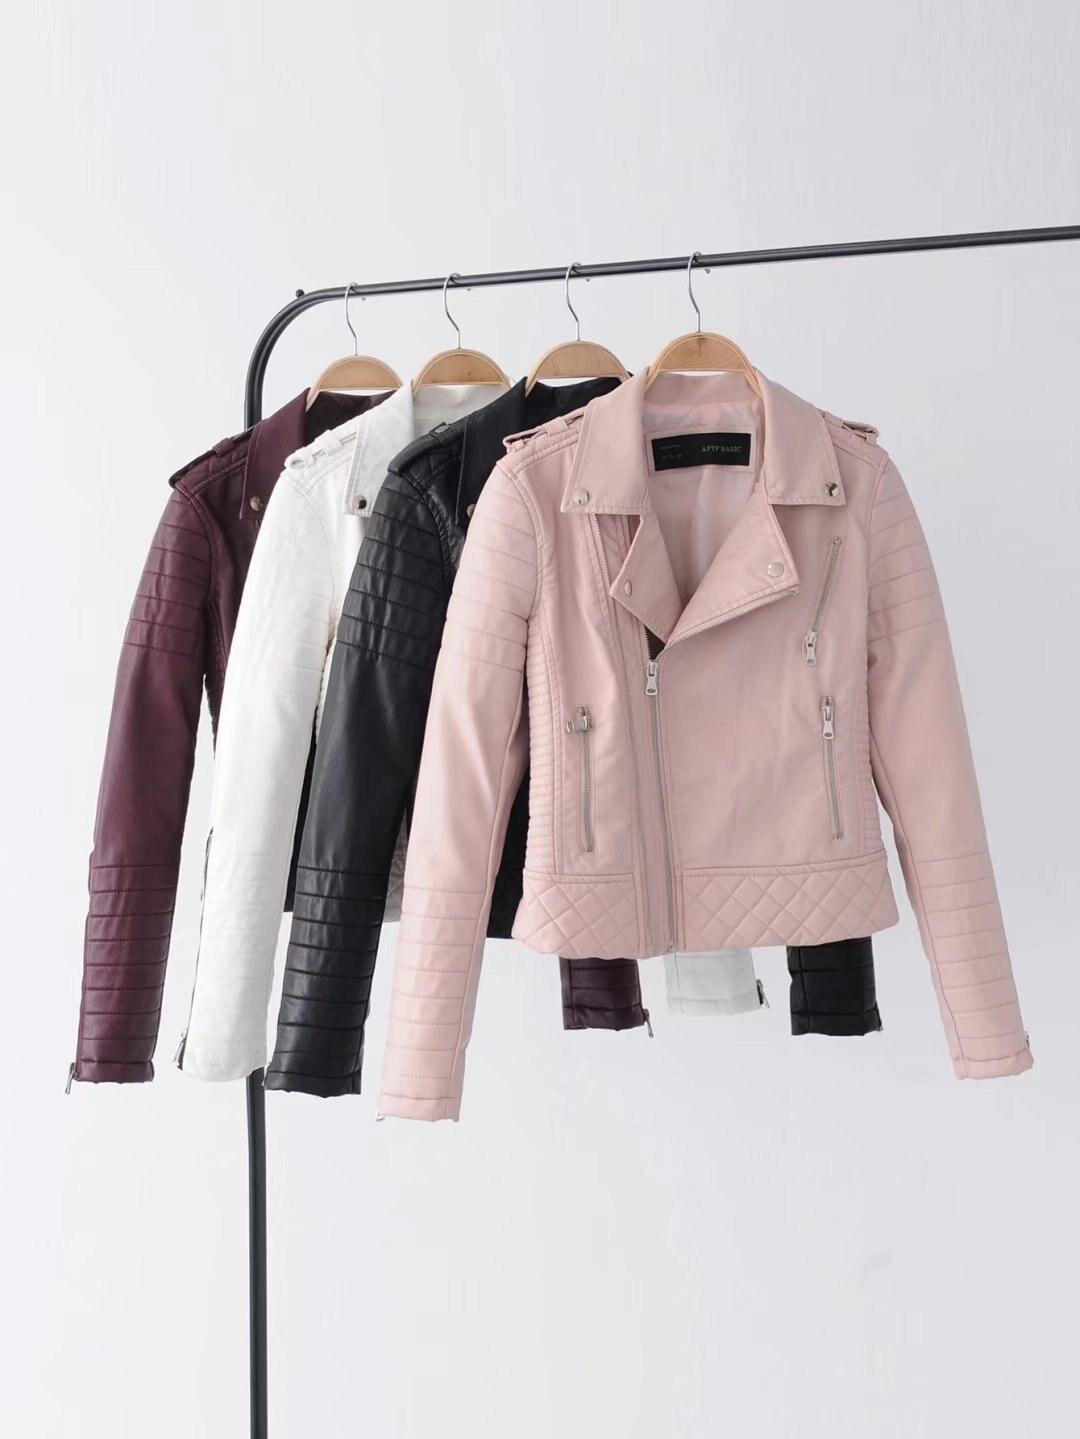 New women's fashion lapel zipper women's leather jacket women's jacket pure color fashion women's jacket women's jacket